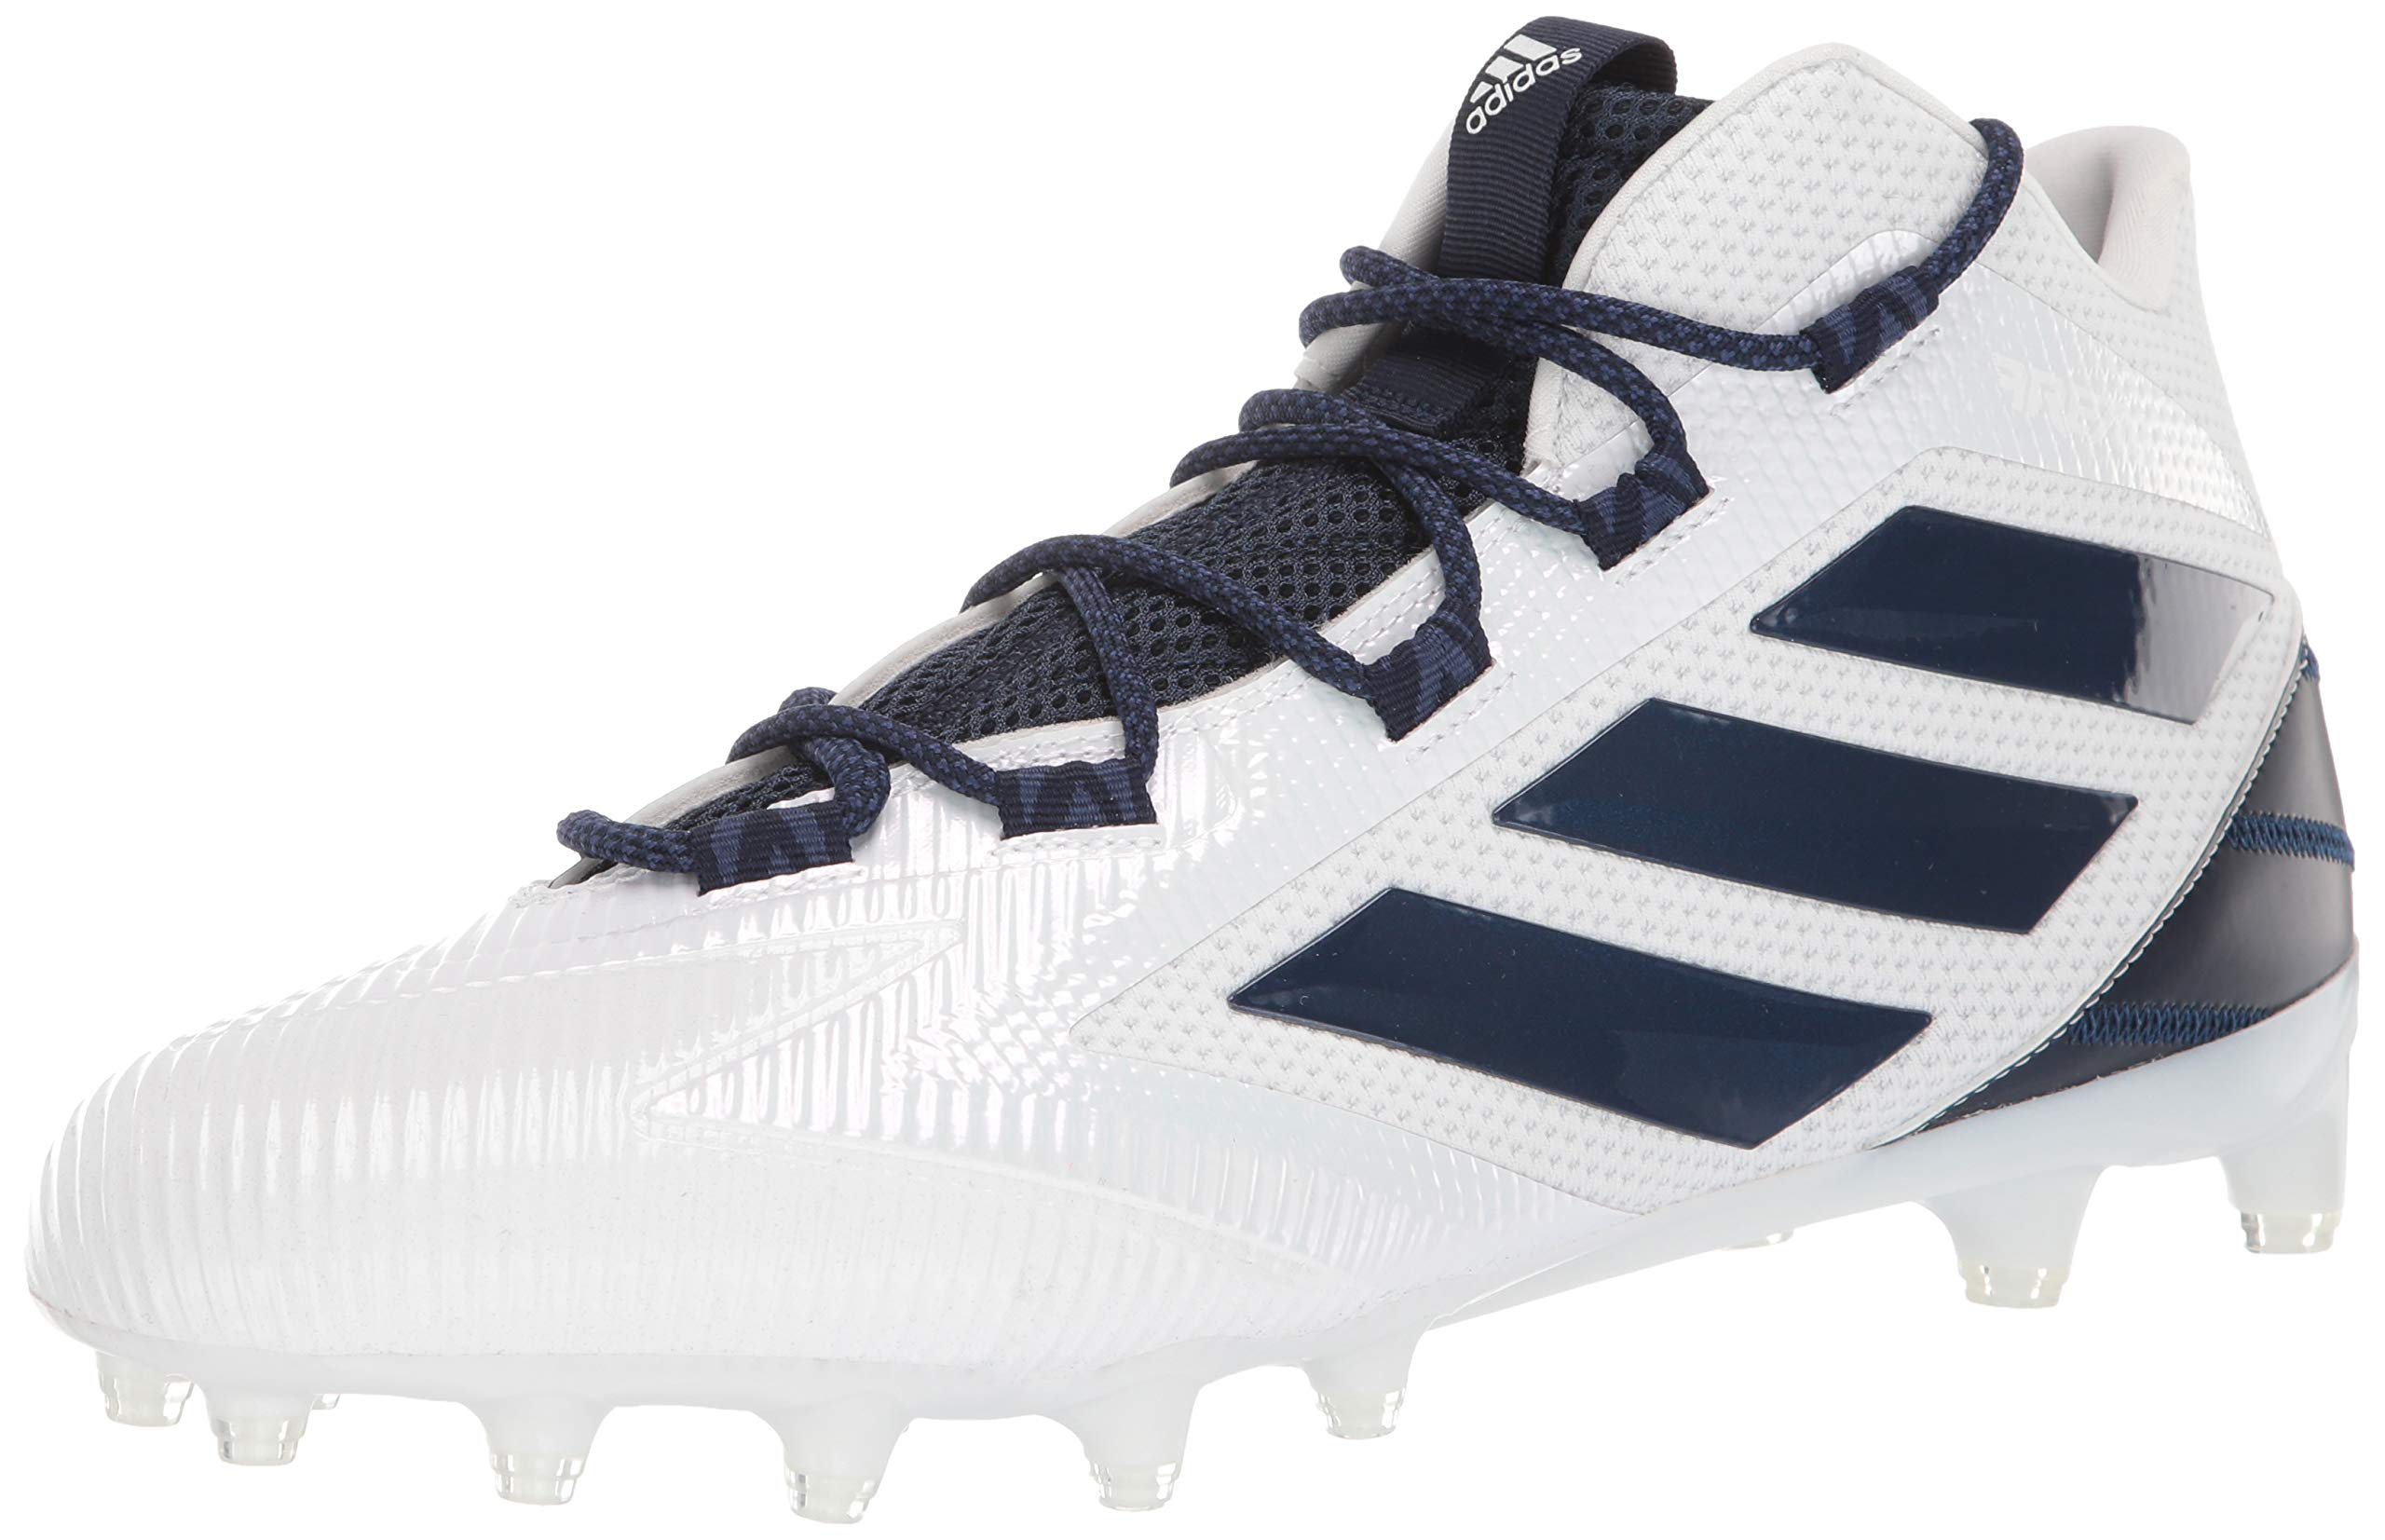 adidas Men's Freak Carbon Mid Football Shoe, White/Collegiate Navy/Noble Indigo, 6.5 Medium US by adidas